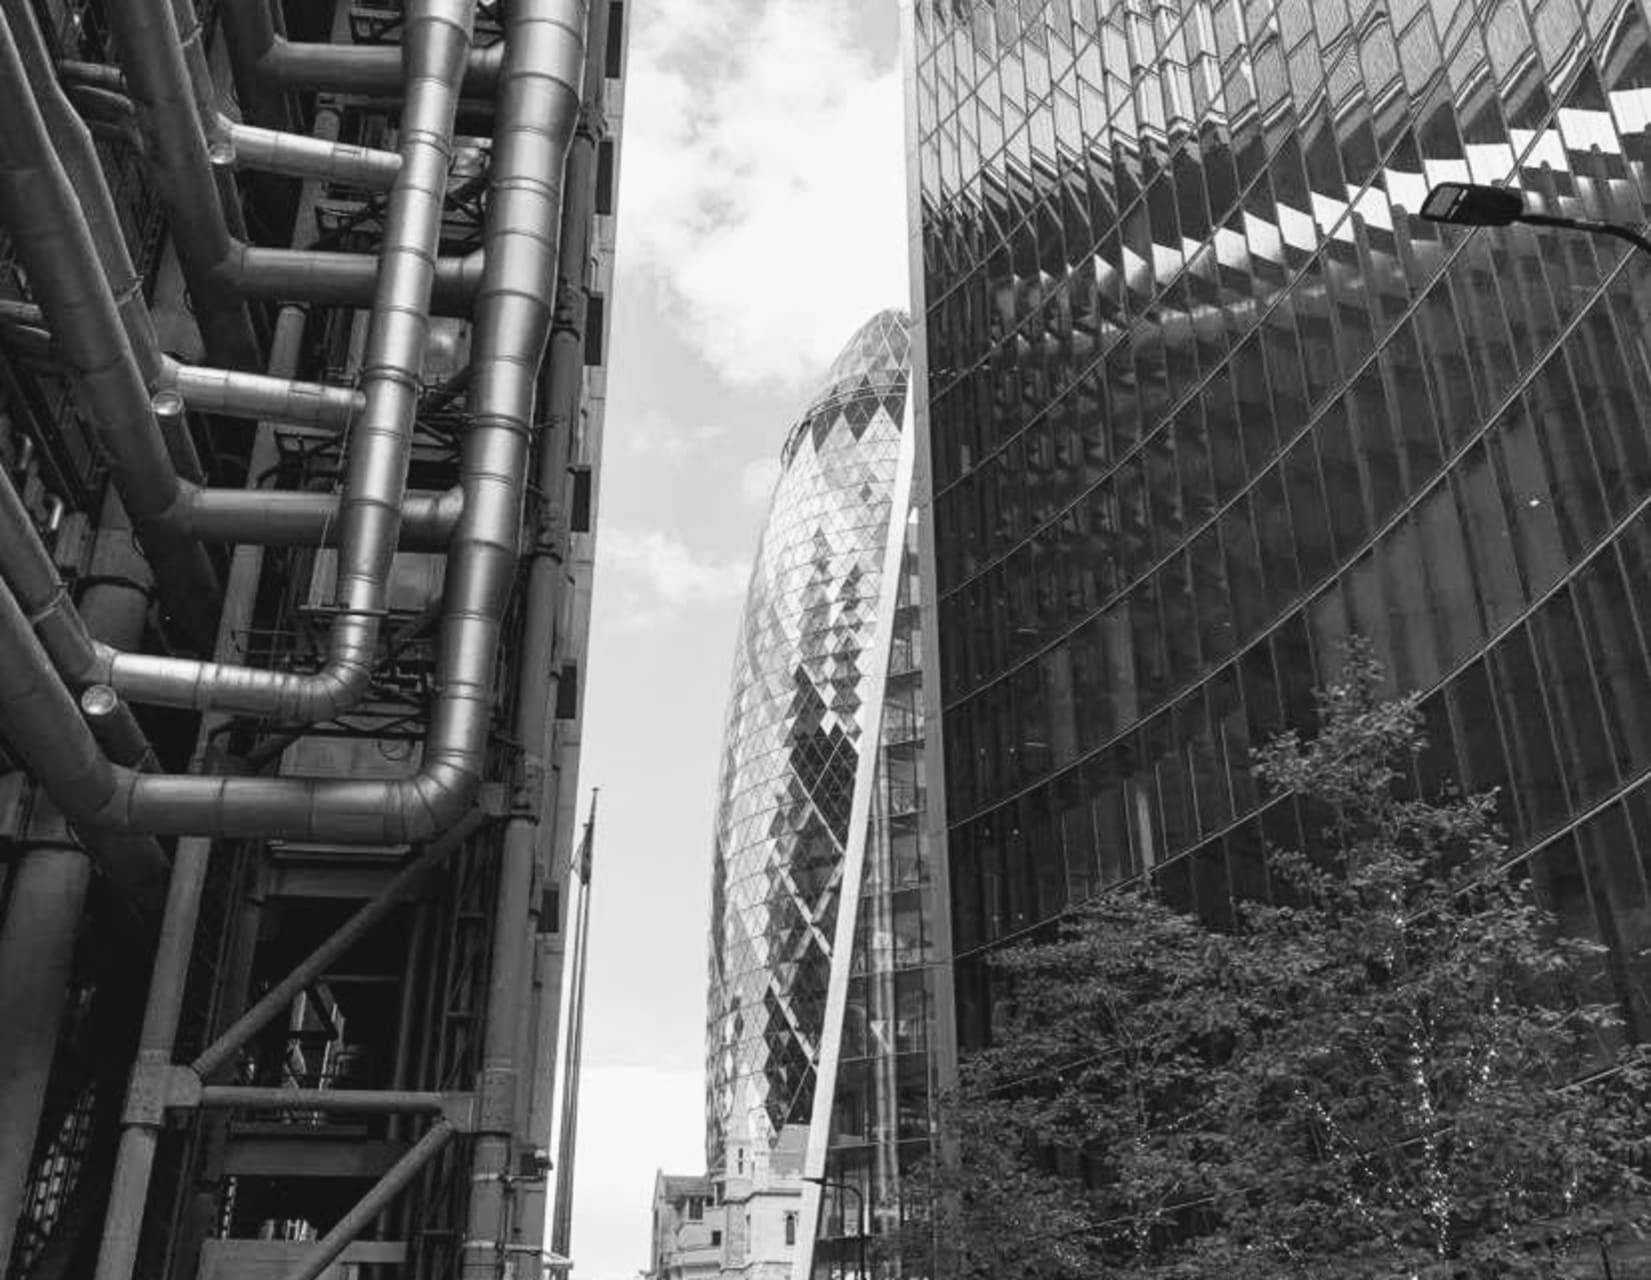 London - Hidden Histories - Dark Secrets of the City